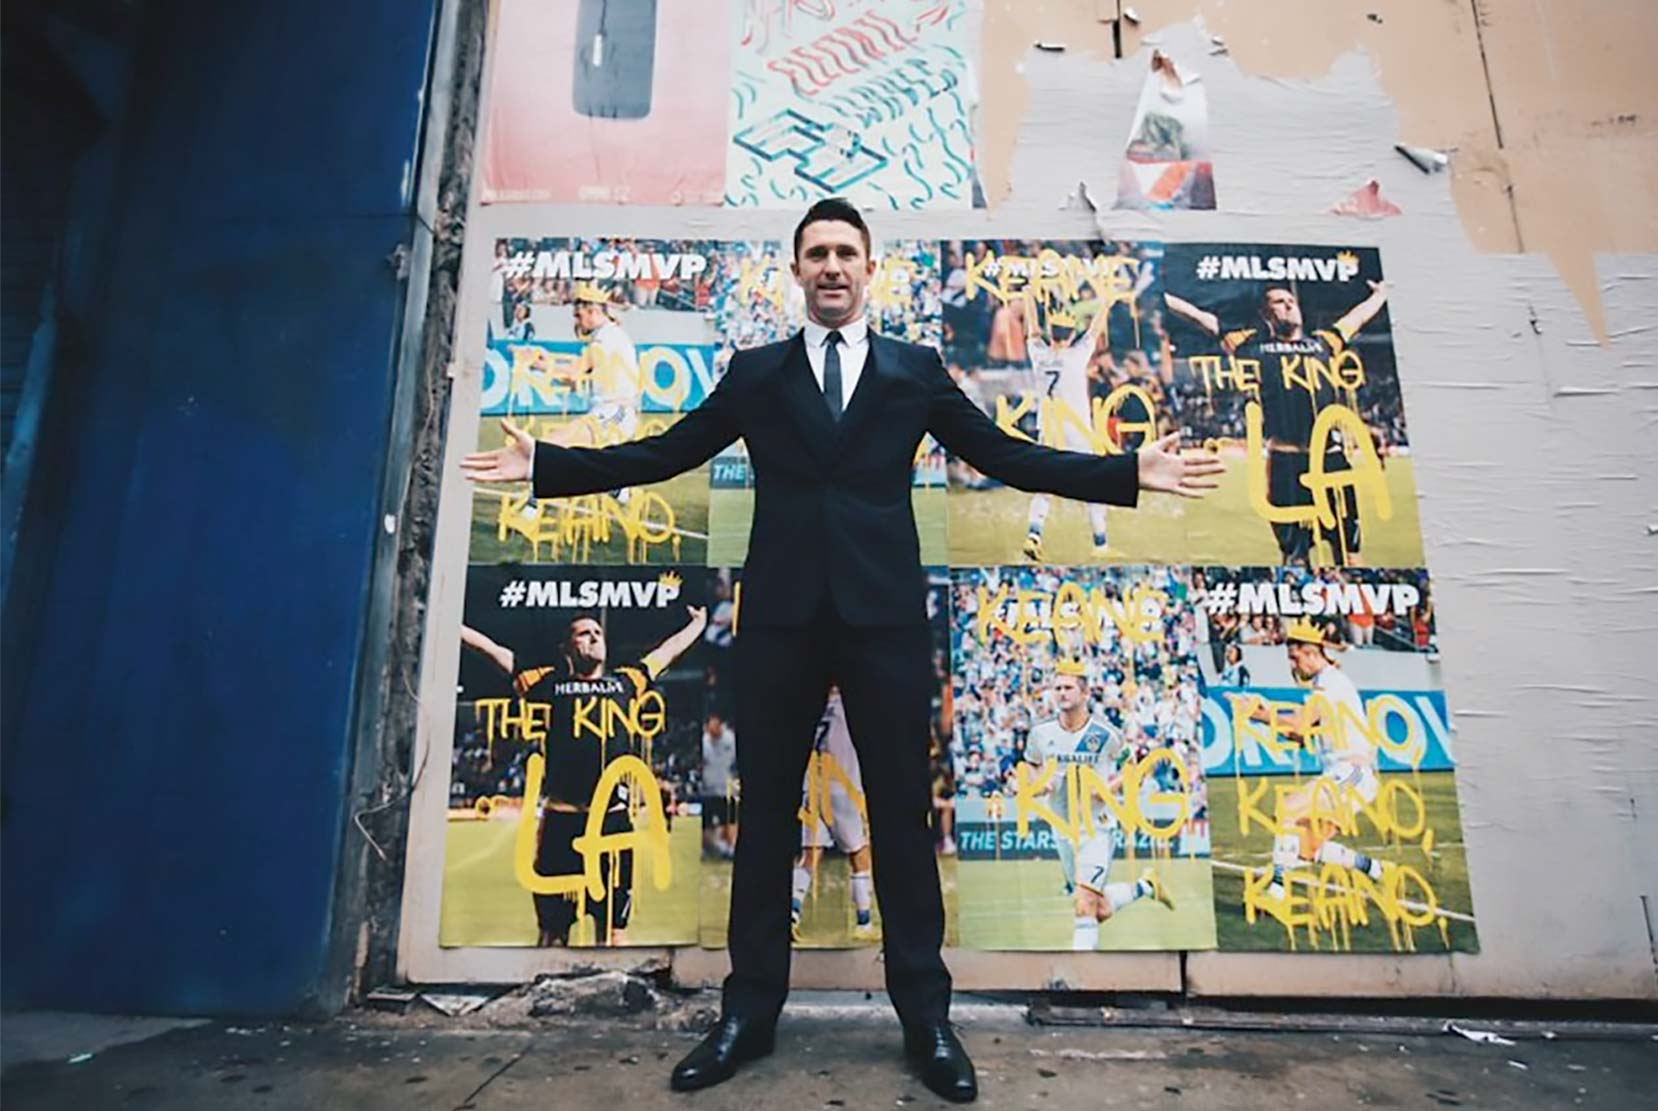 LA Galaxy's Robbie Keane